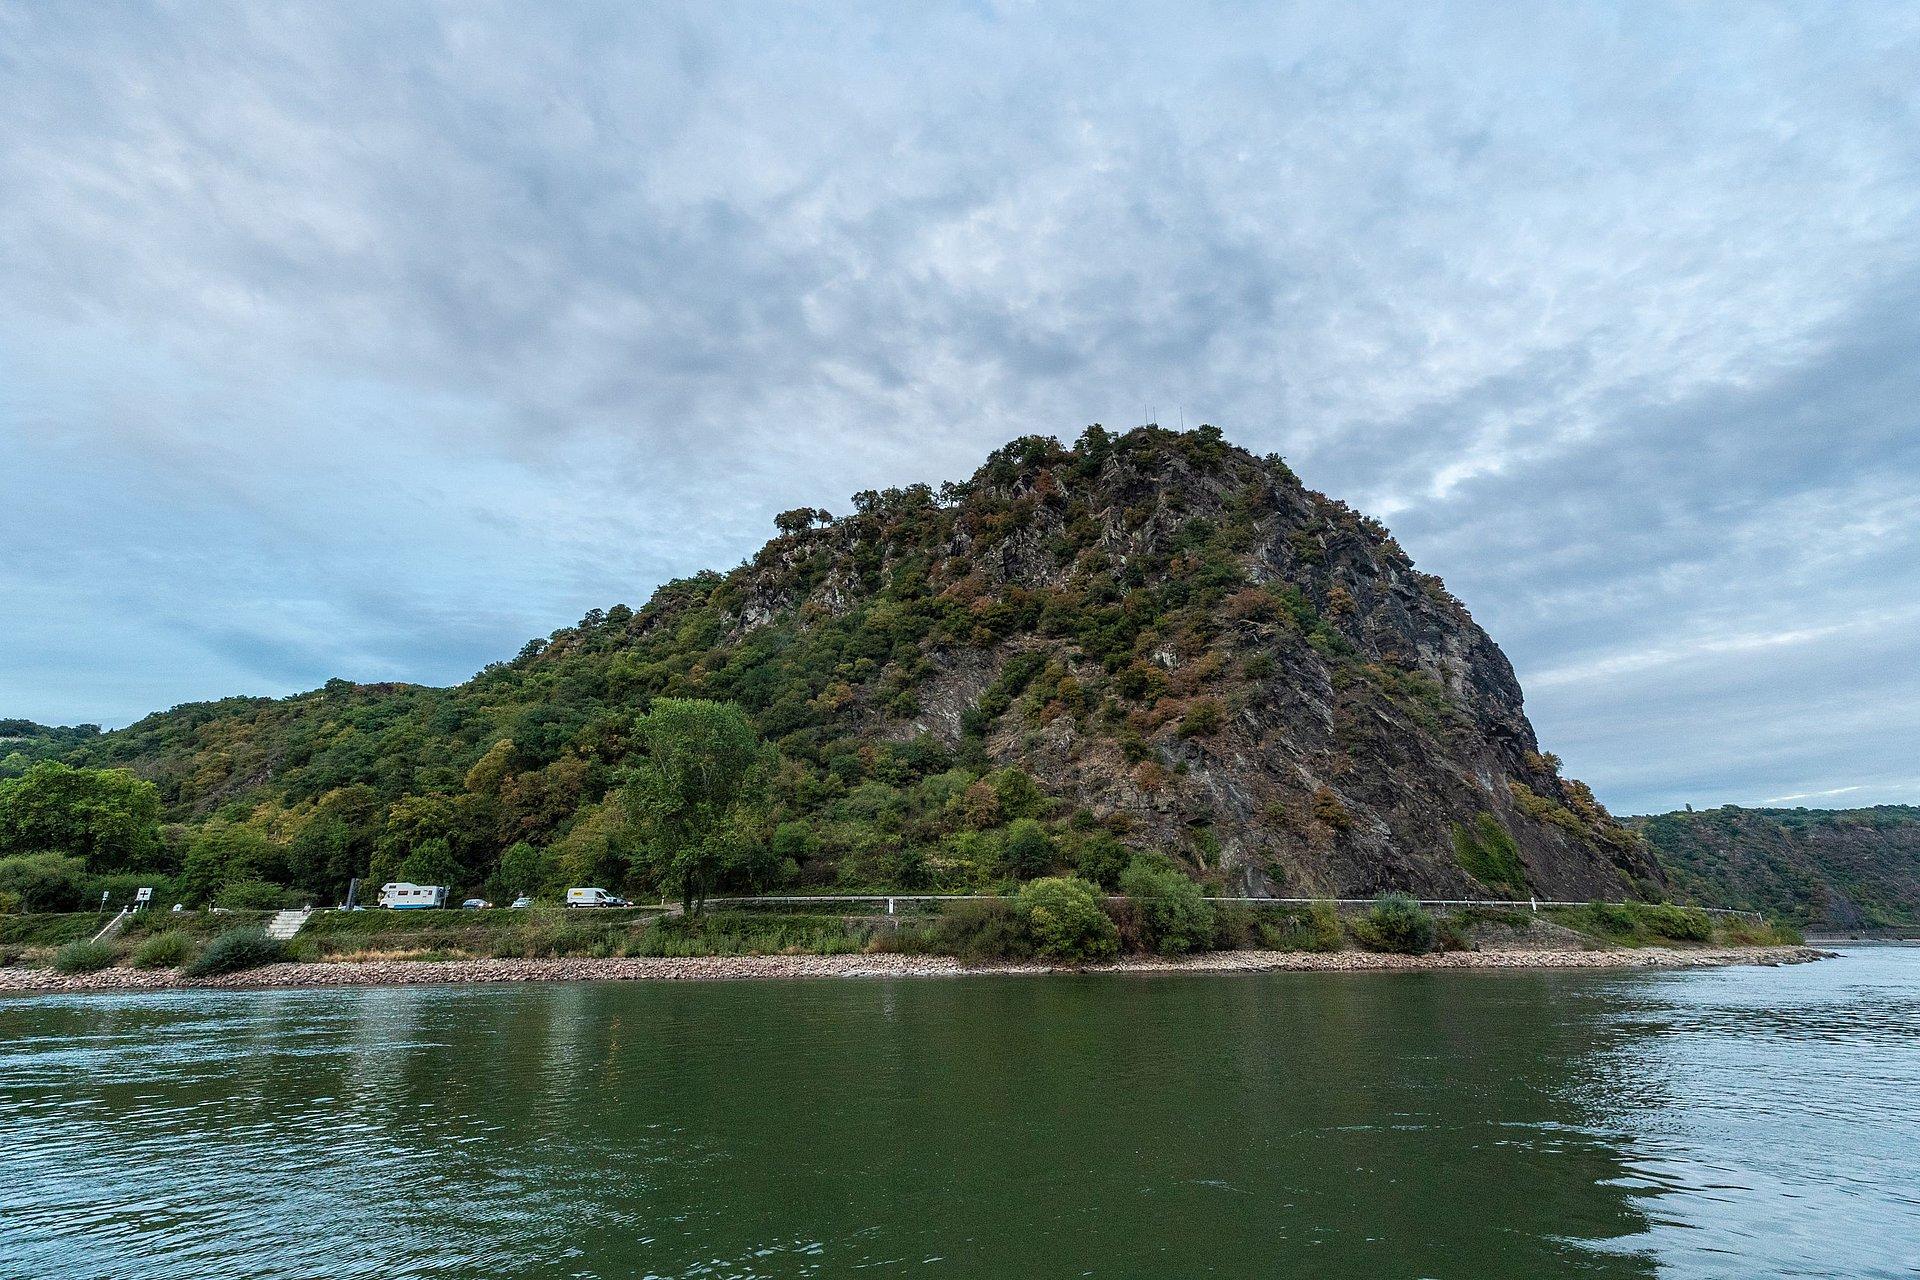 Lorelei Rock at St. Goarshausen, Romantic Rhine